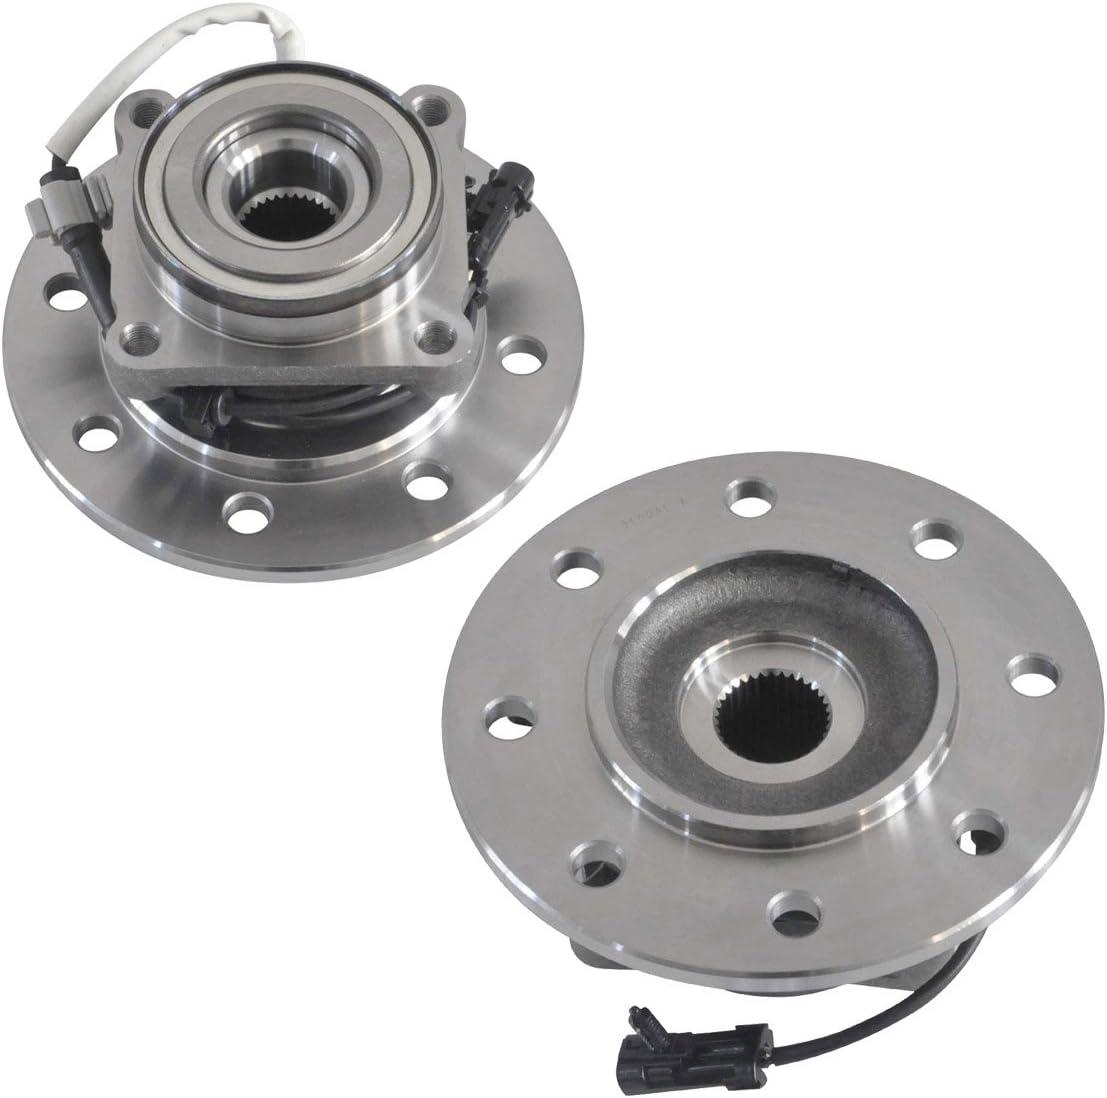 2* Front Wheel Hub Bearing For Chevy GMC K2500 K3500 Suburban 4WD 8 Lugs 515041